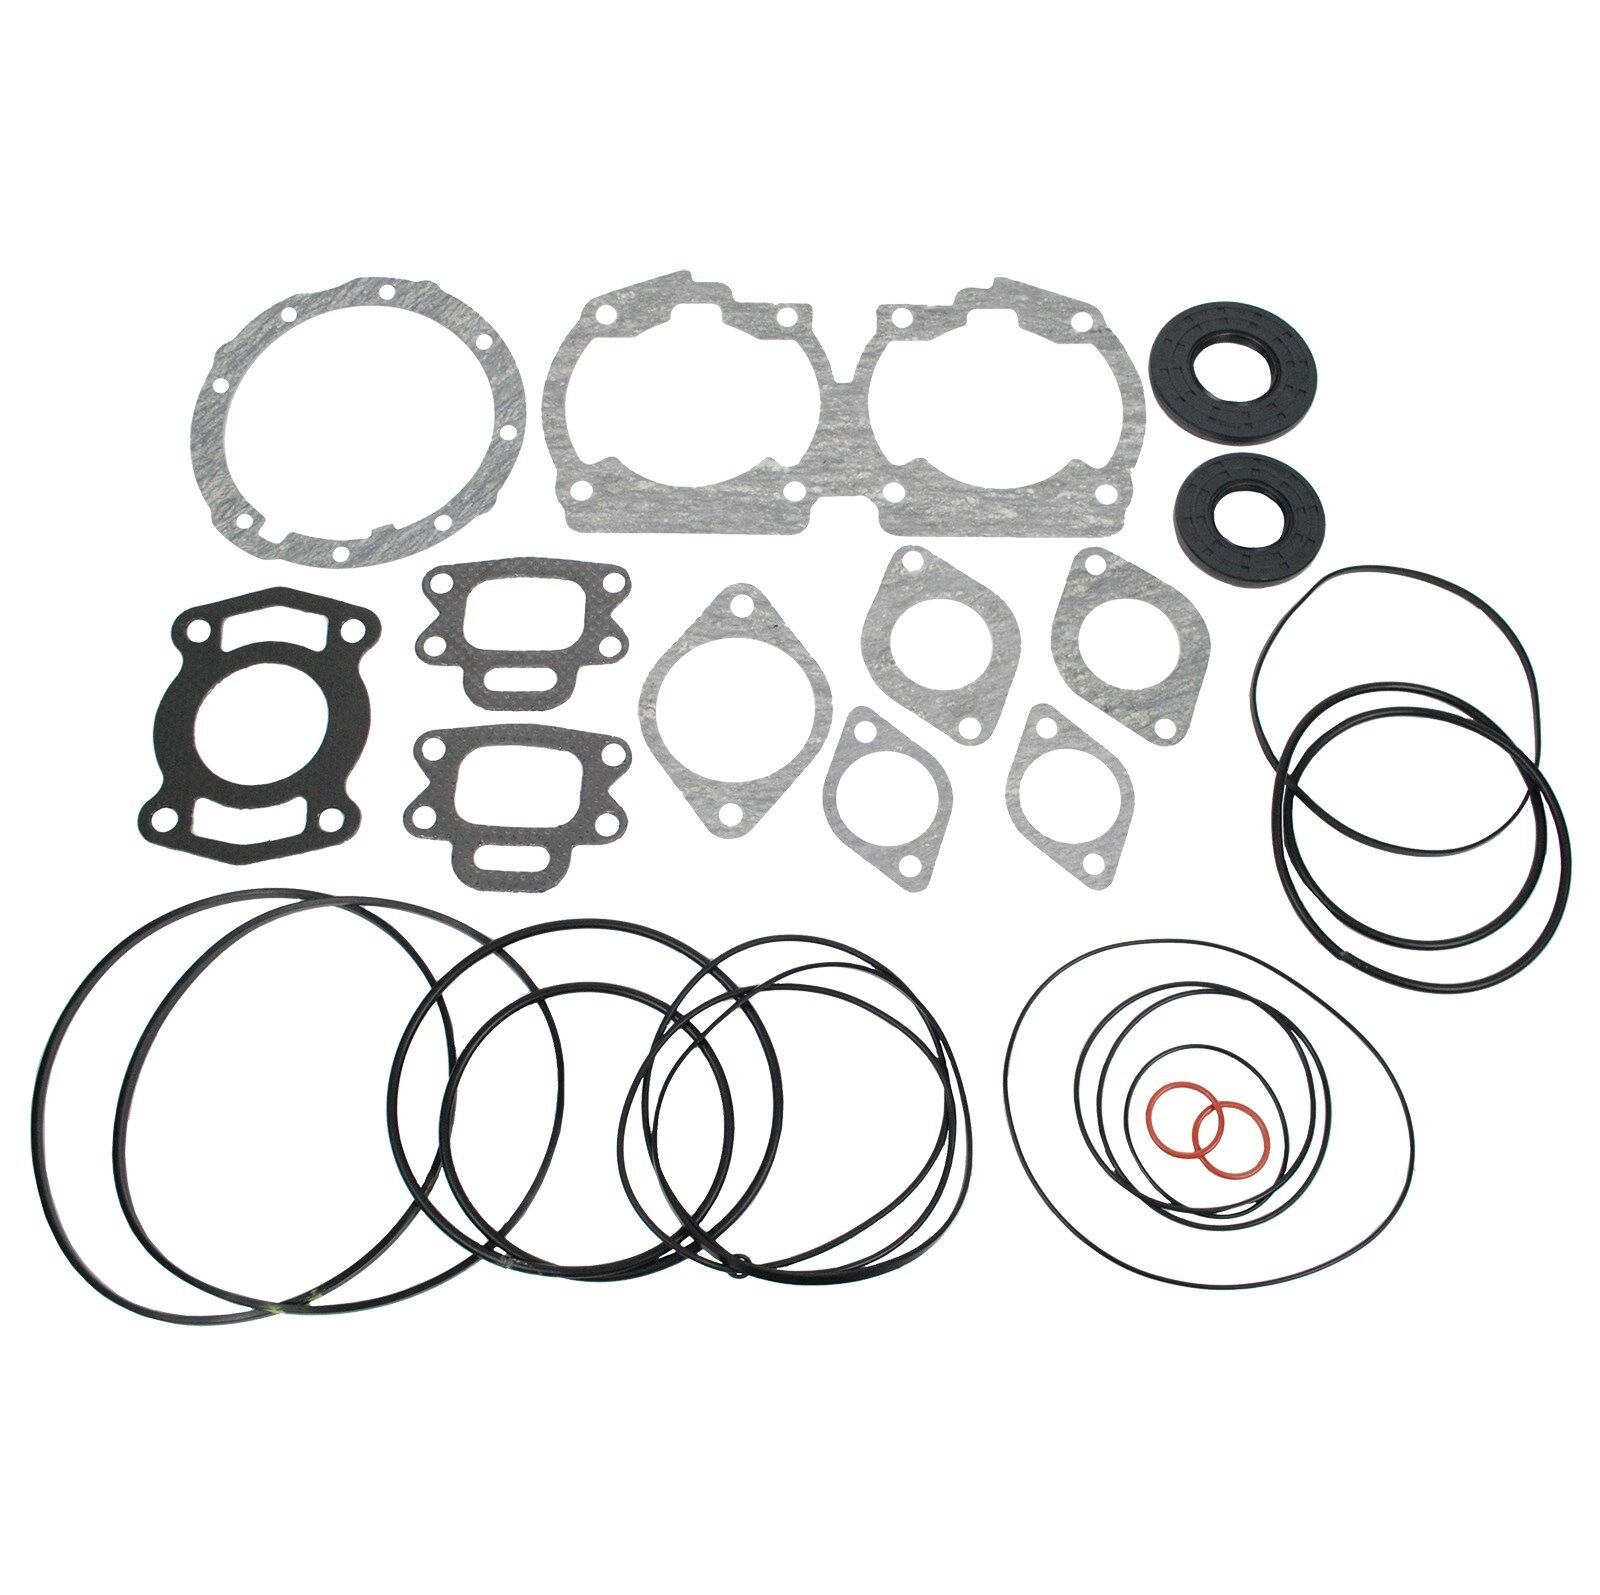 Seadoo Complete Gasket Kit 587 White GTS SP SPI 420931161